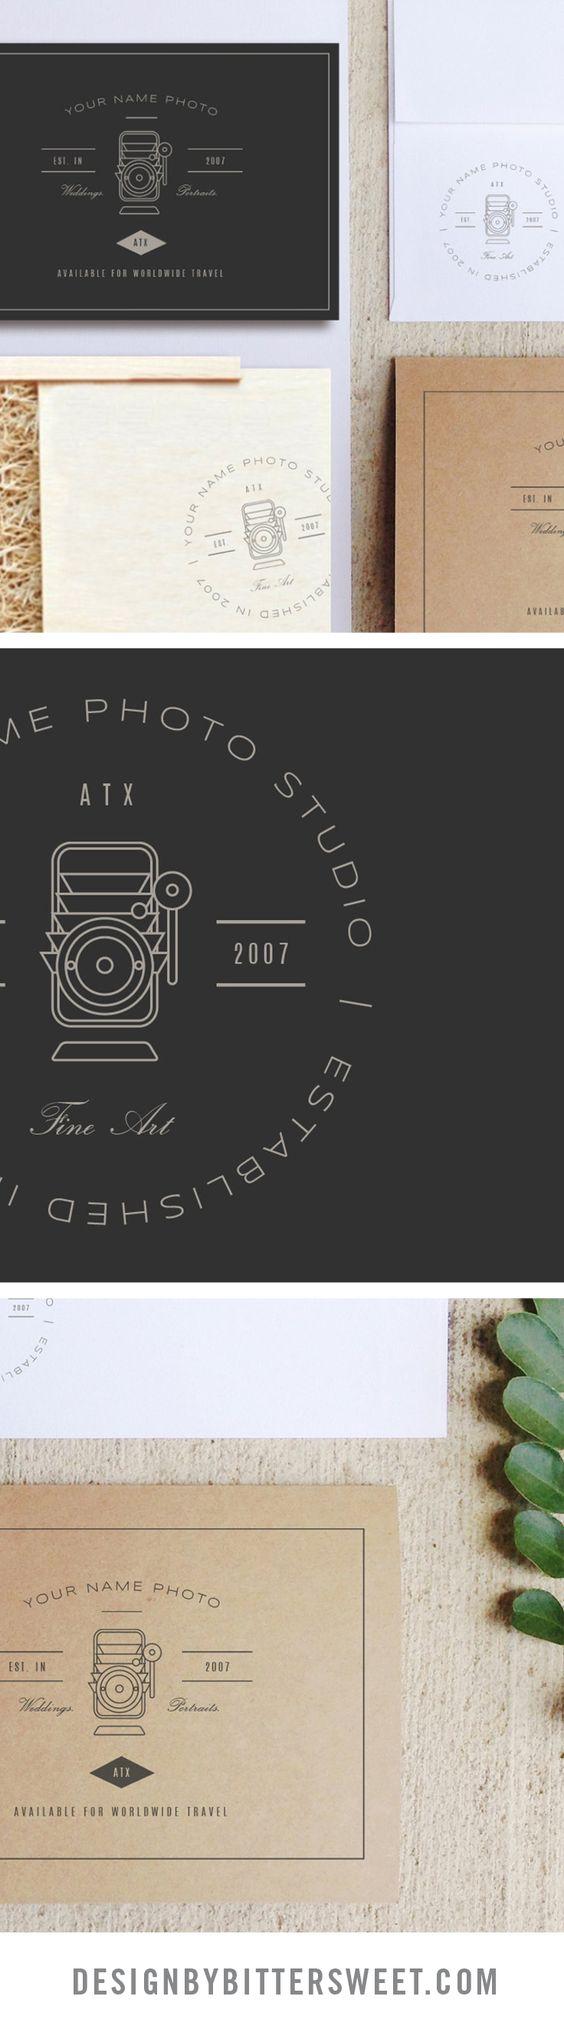 Photographer logo, logos and wedding photography on pinterest